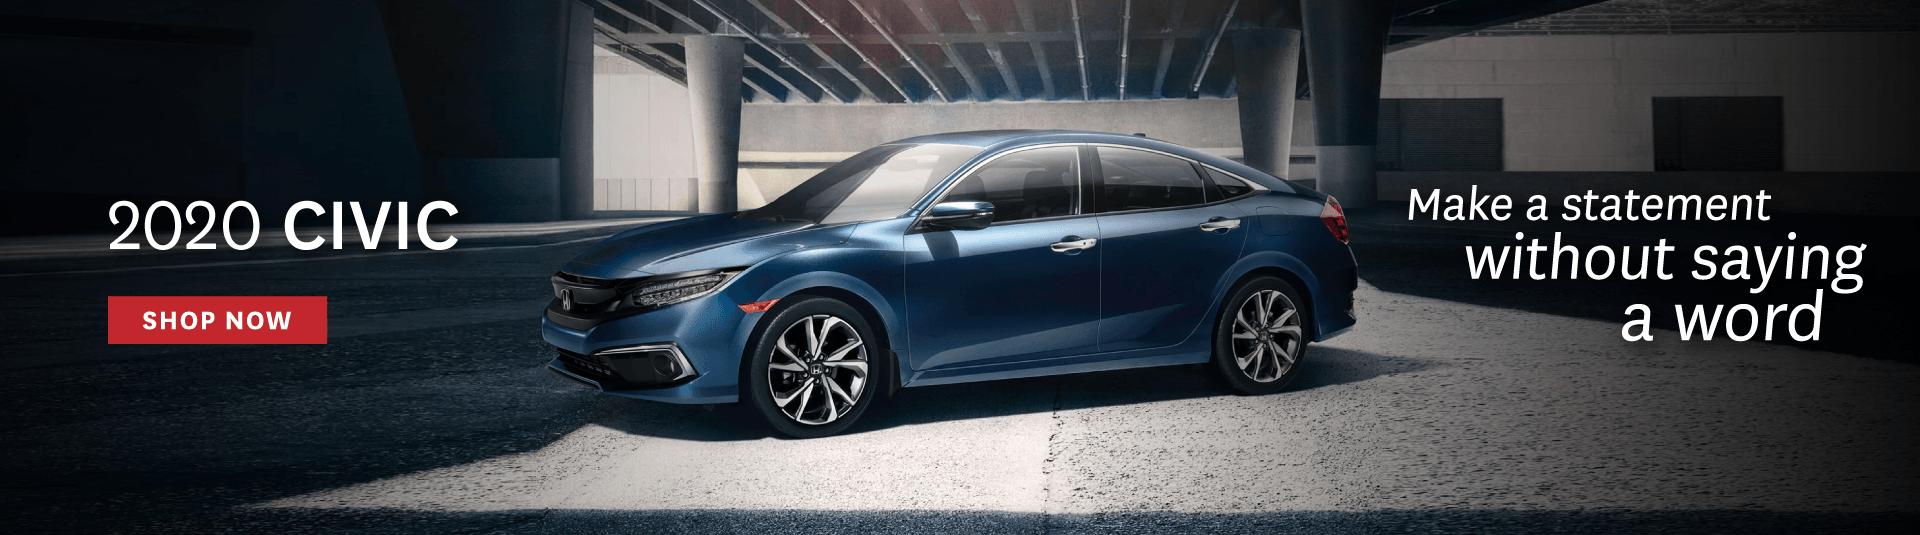 2020 Civic - Goderich Honda